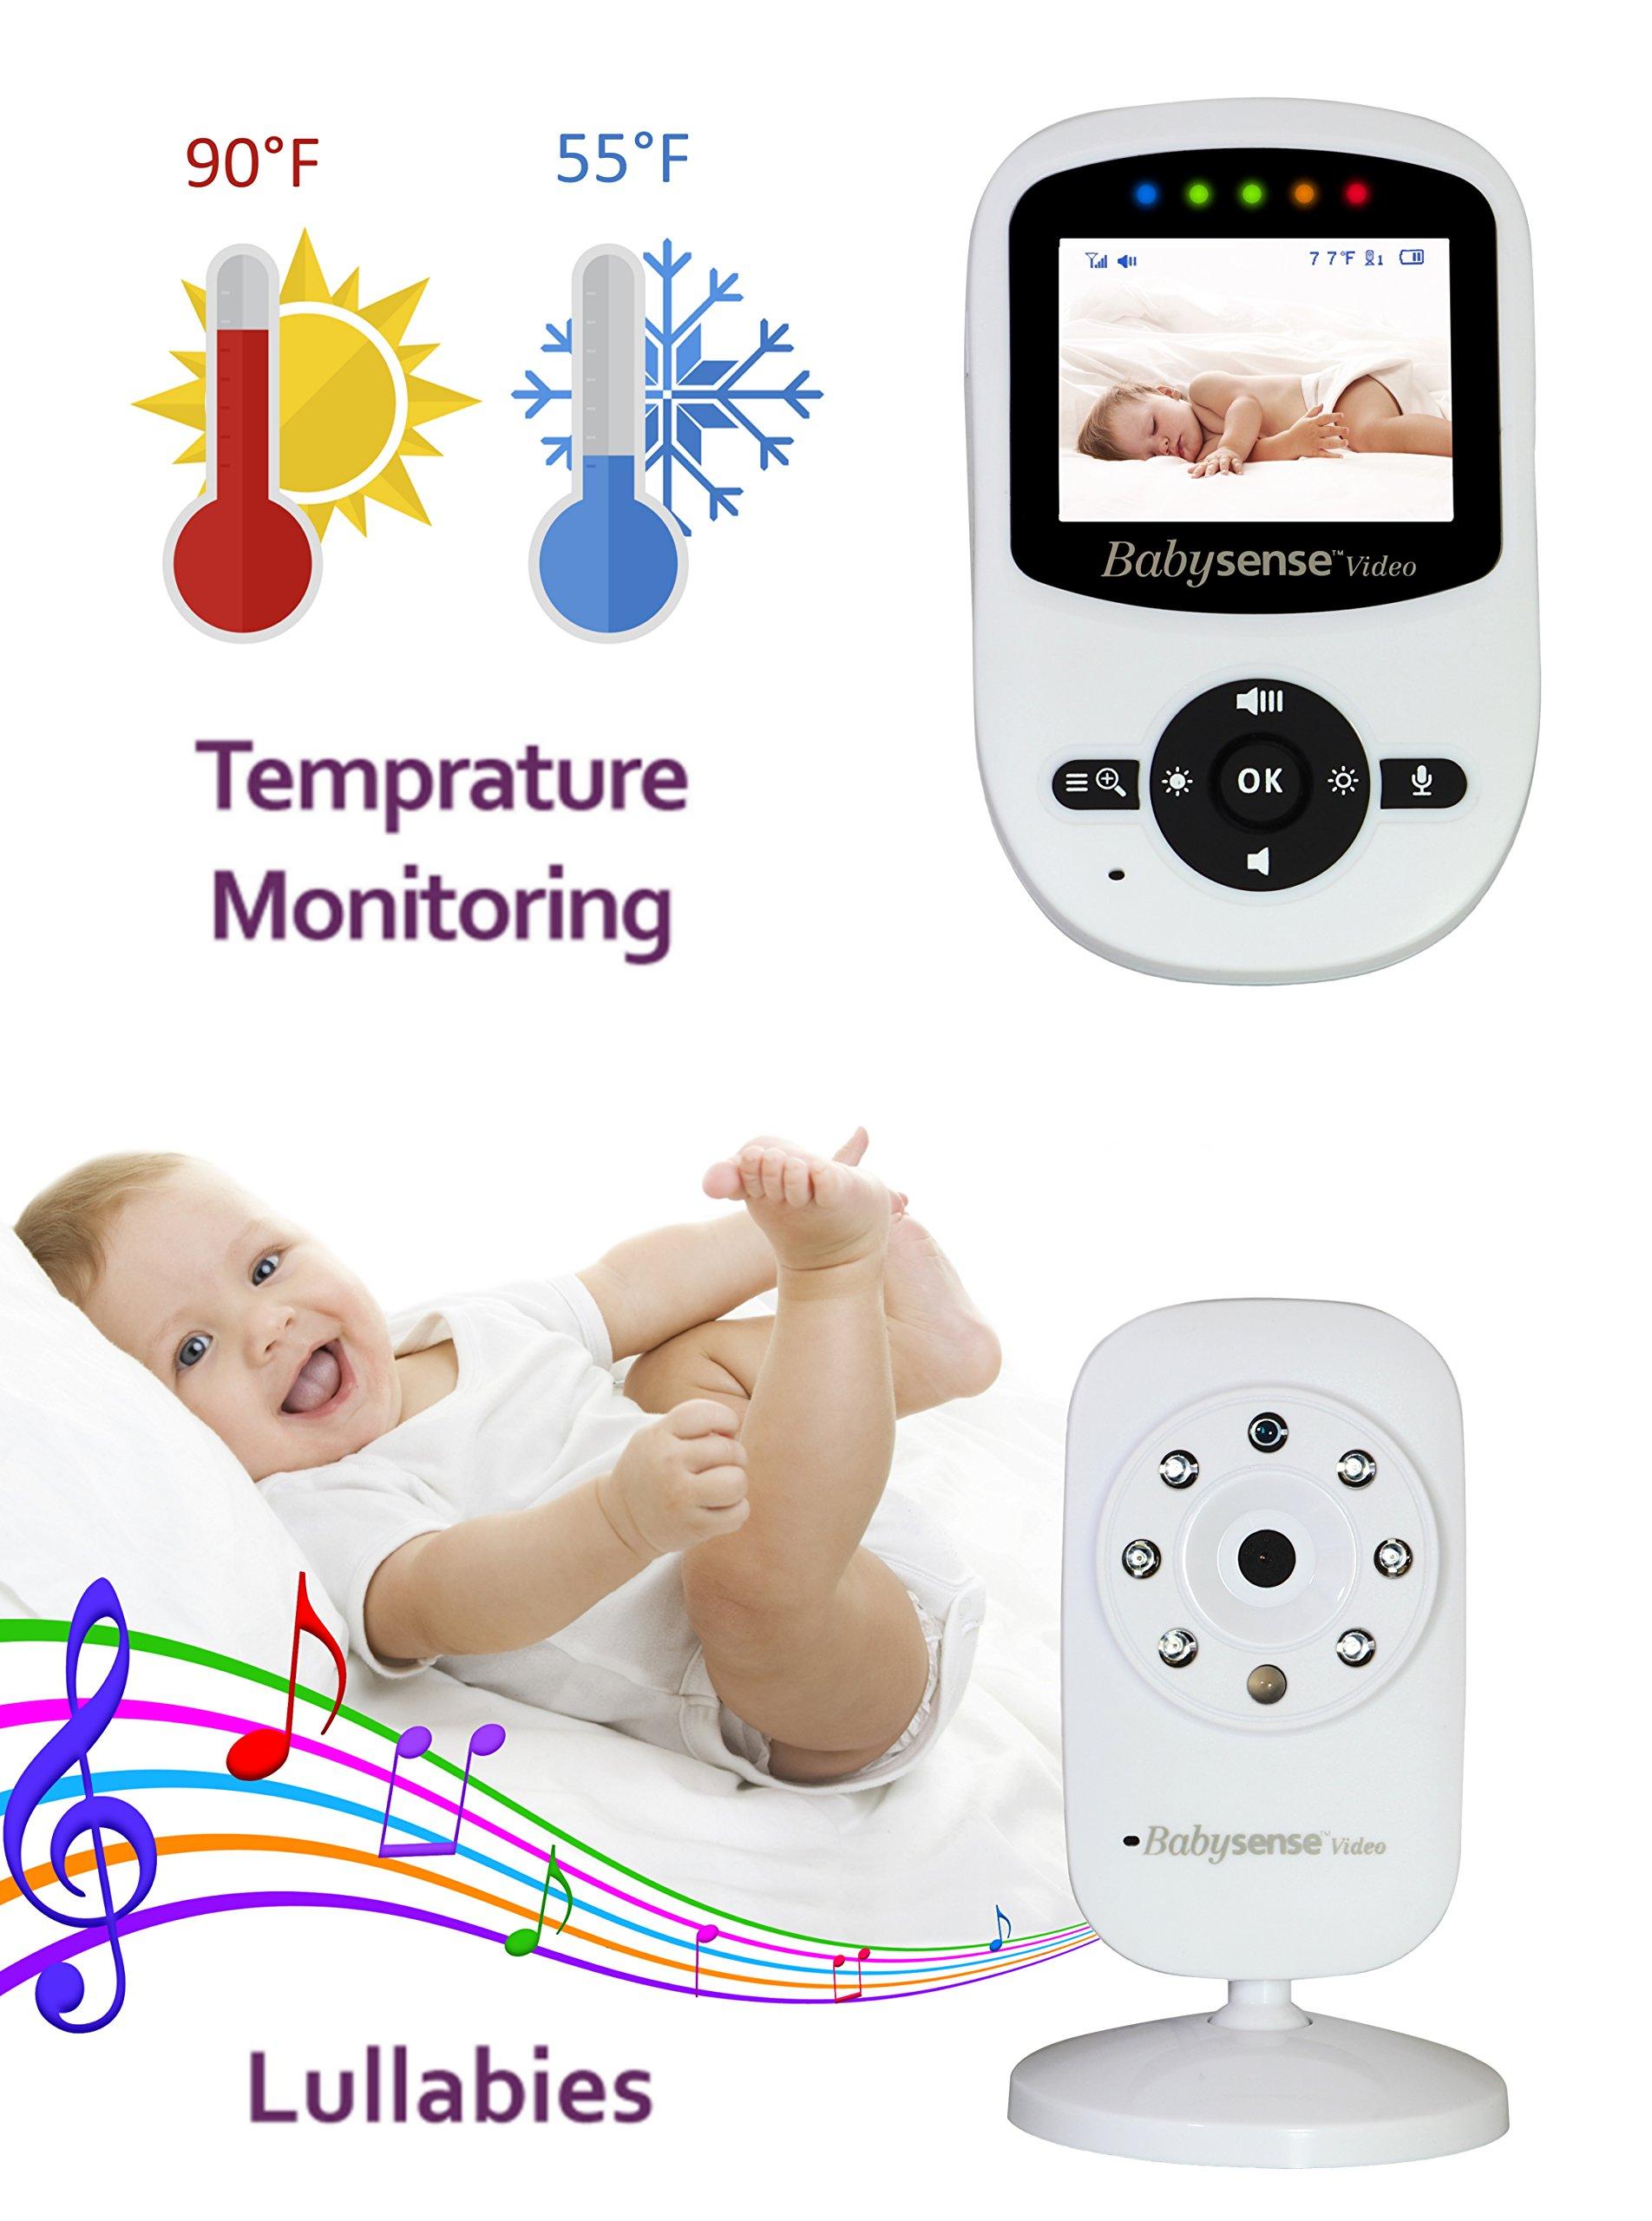 New Model: Babysense Video + Baby Movement Monitor - Bundle Pack: Babysense Video Baby Monitor with Babysense 7 Under-The-Mattress Baby Movement Monitor - 2 in 1 by Babysense (Image #7)